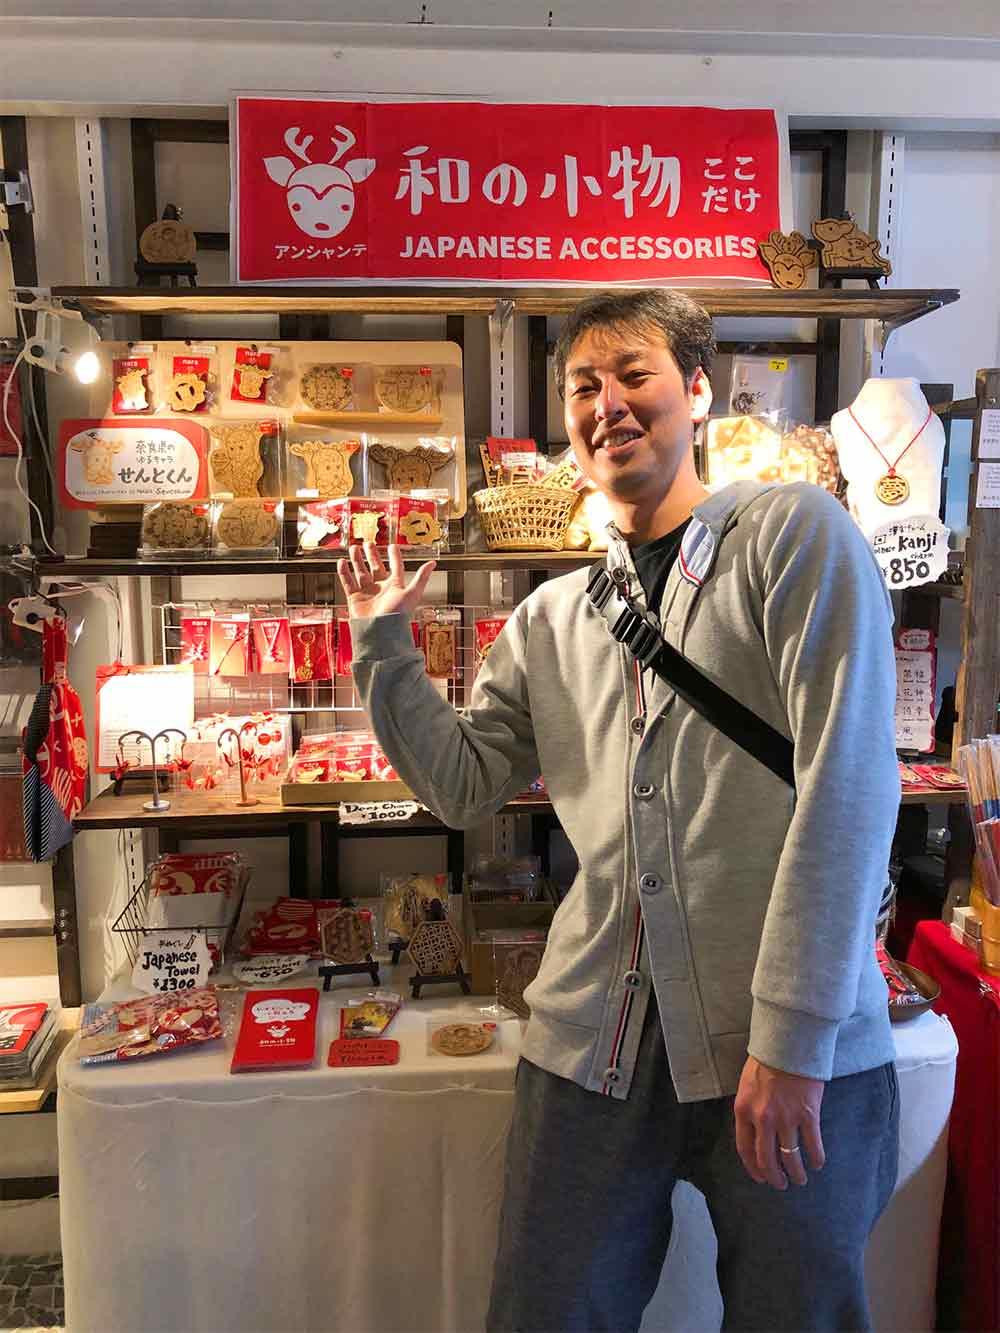 sento waka - 奈良のゆるキャラ★せんとくんグッズ始めました